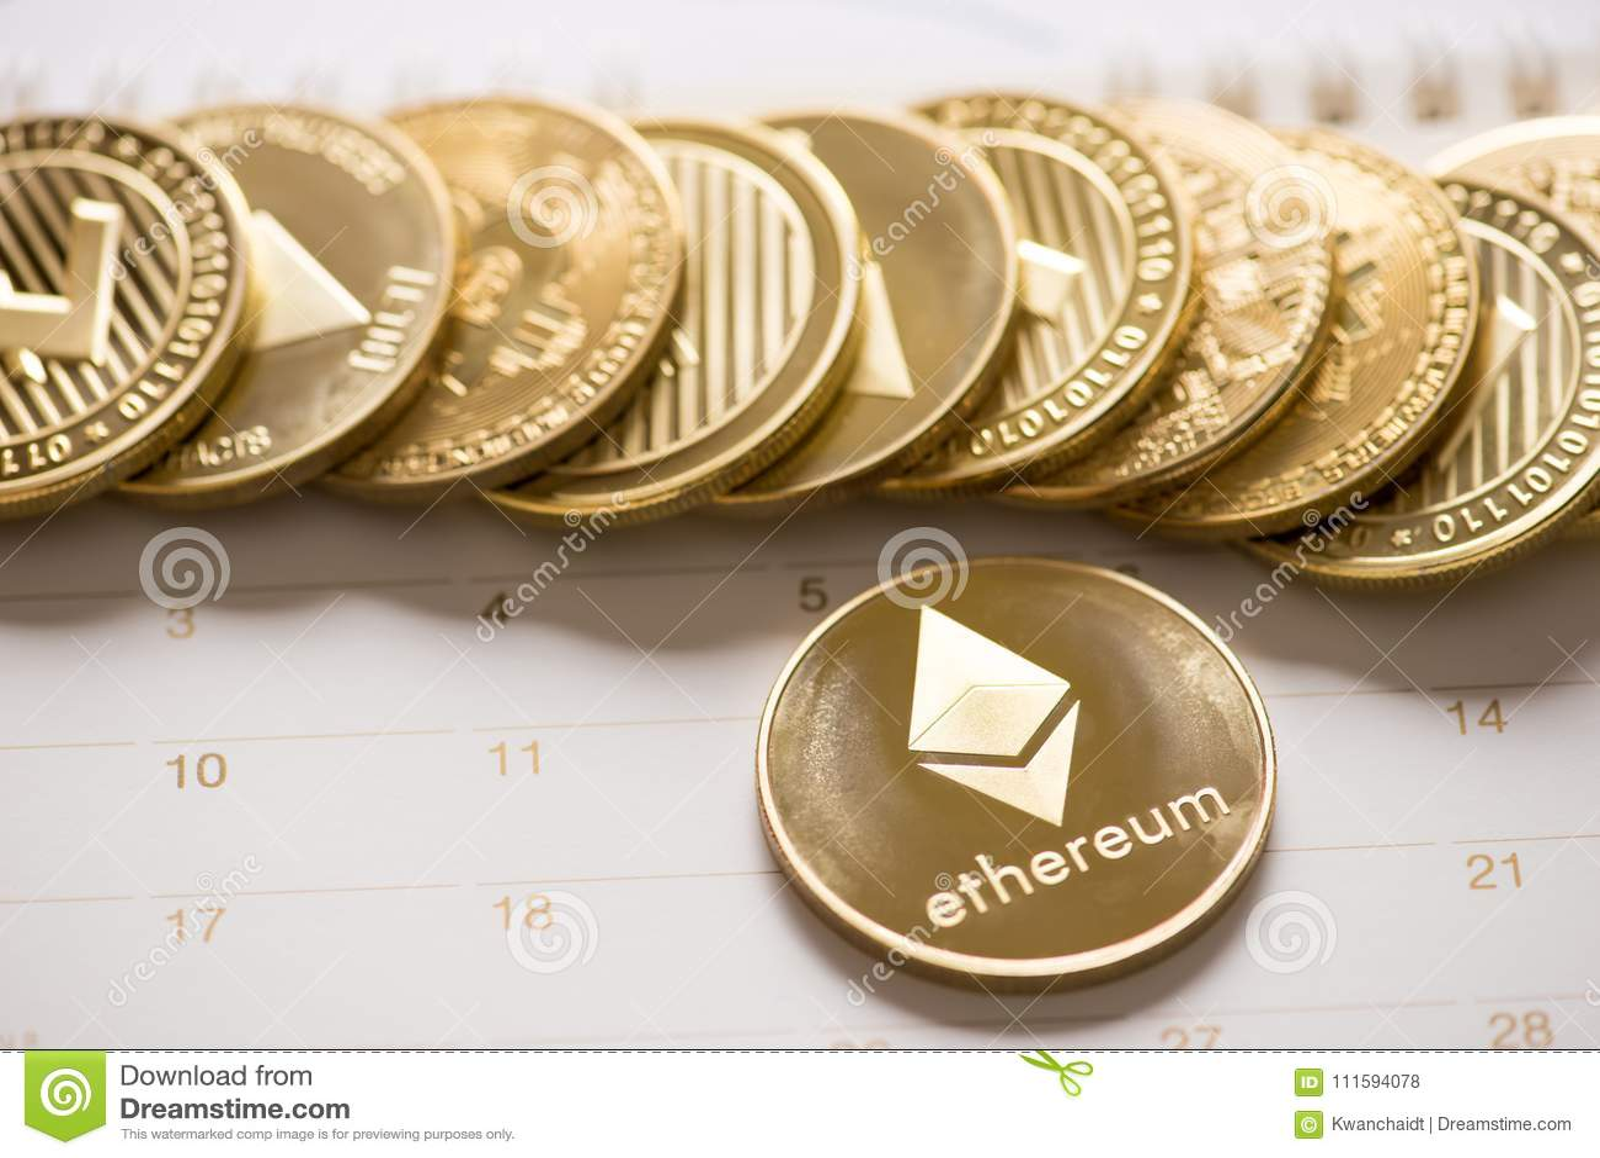 ethereum digital currency